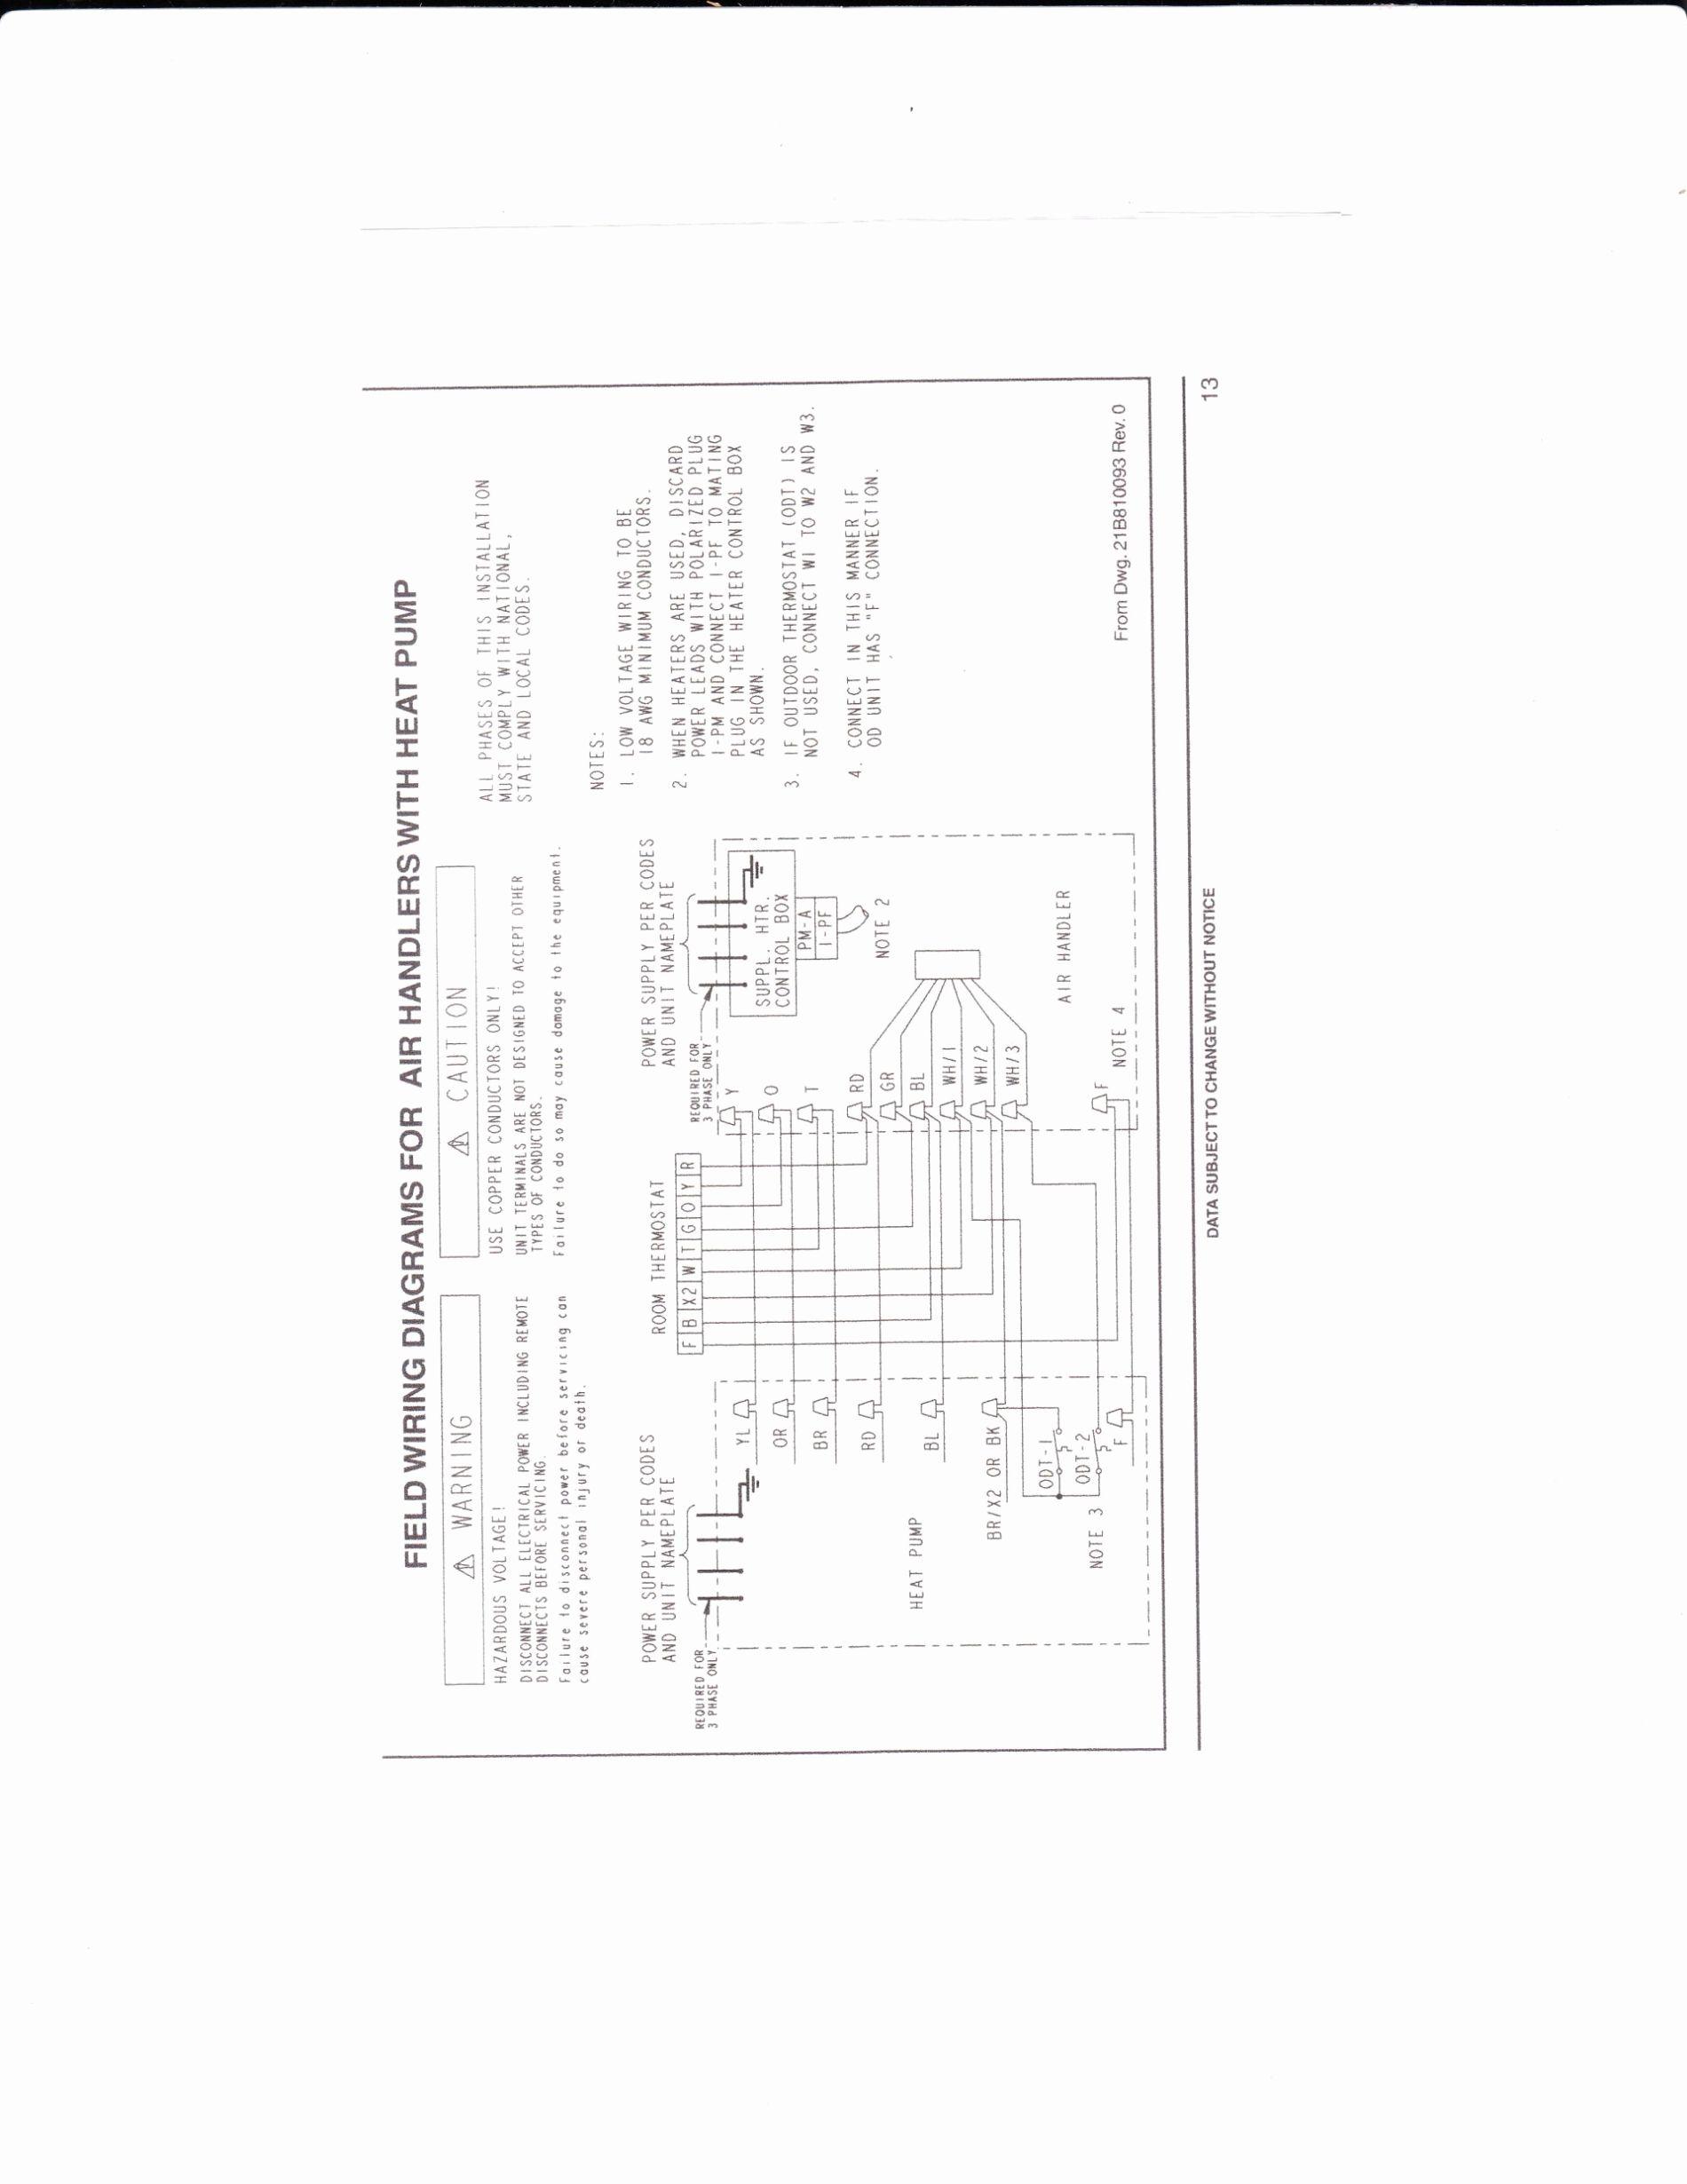 Aruf Wiring Diagram - Trusted Wiring Diagram Online - Goodman Air Handler Wiring Diagram